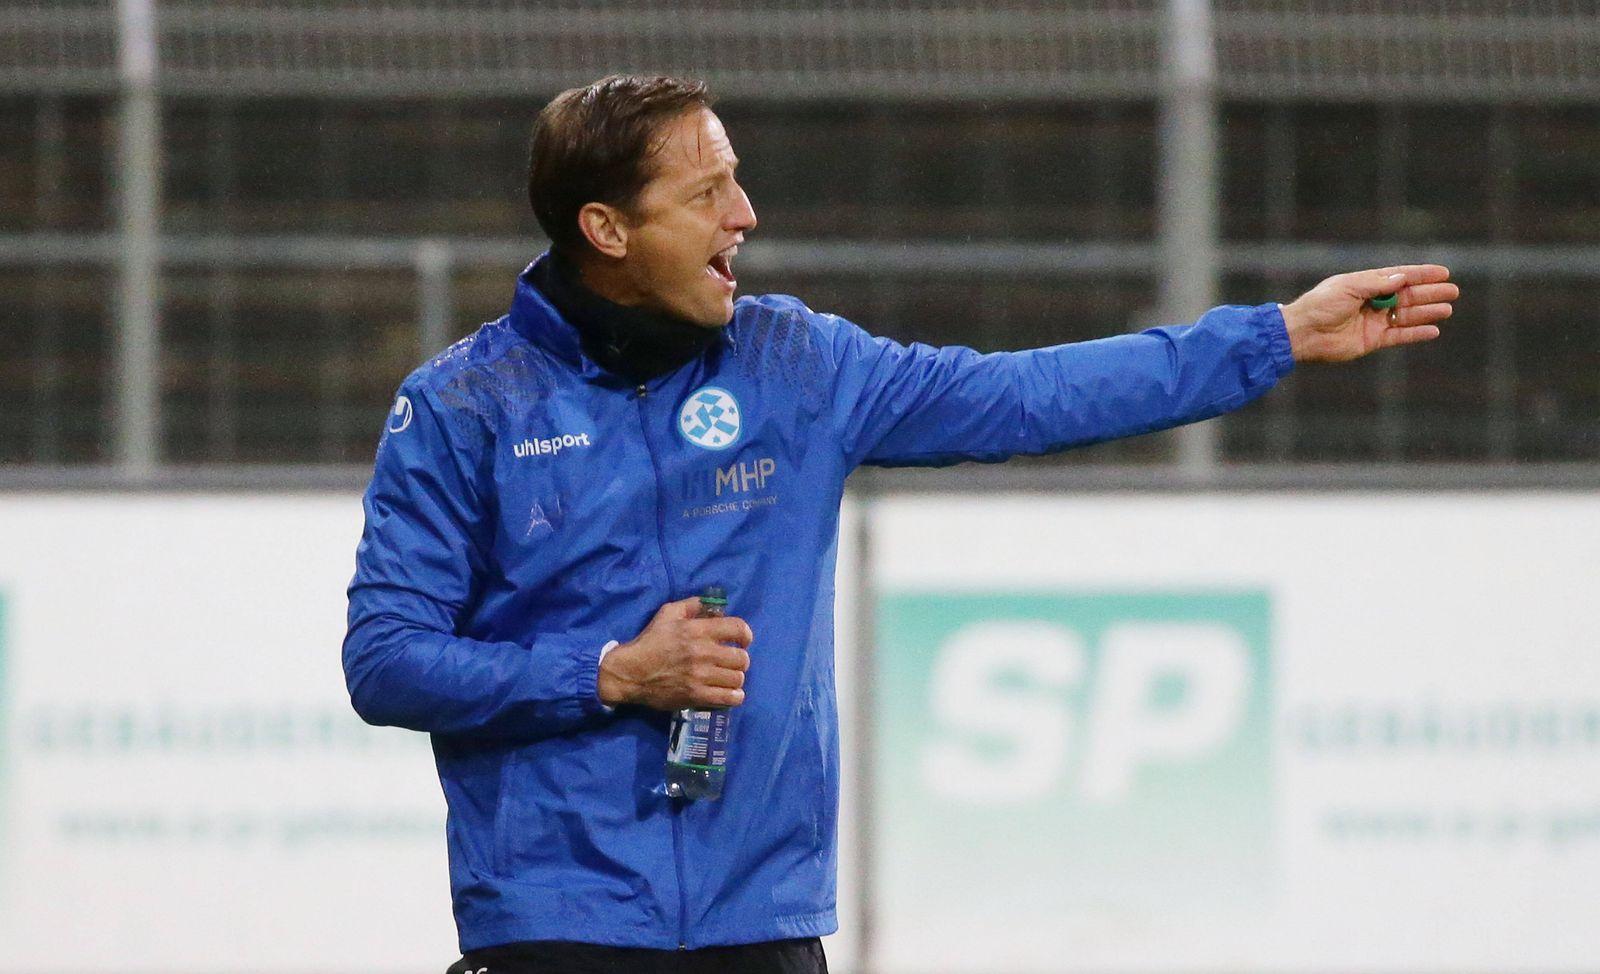 Stuttgart , Fußball WFV Pokal Viertelfinale , SV Stuttgarter Kickers vs. FV Ravensburg , Ramon Gehrmann ( Trainer Kicke